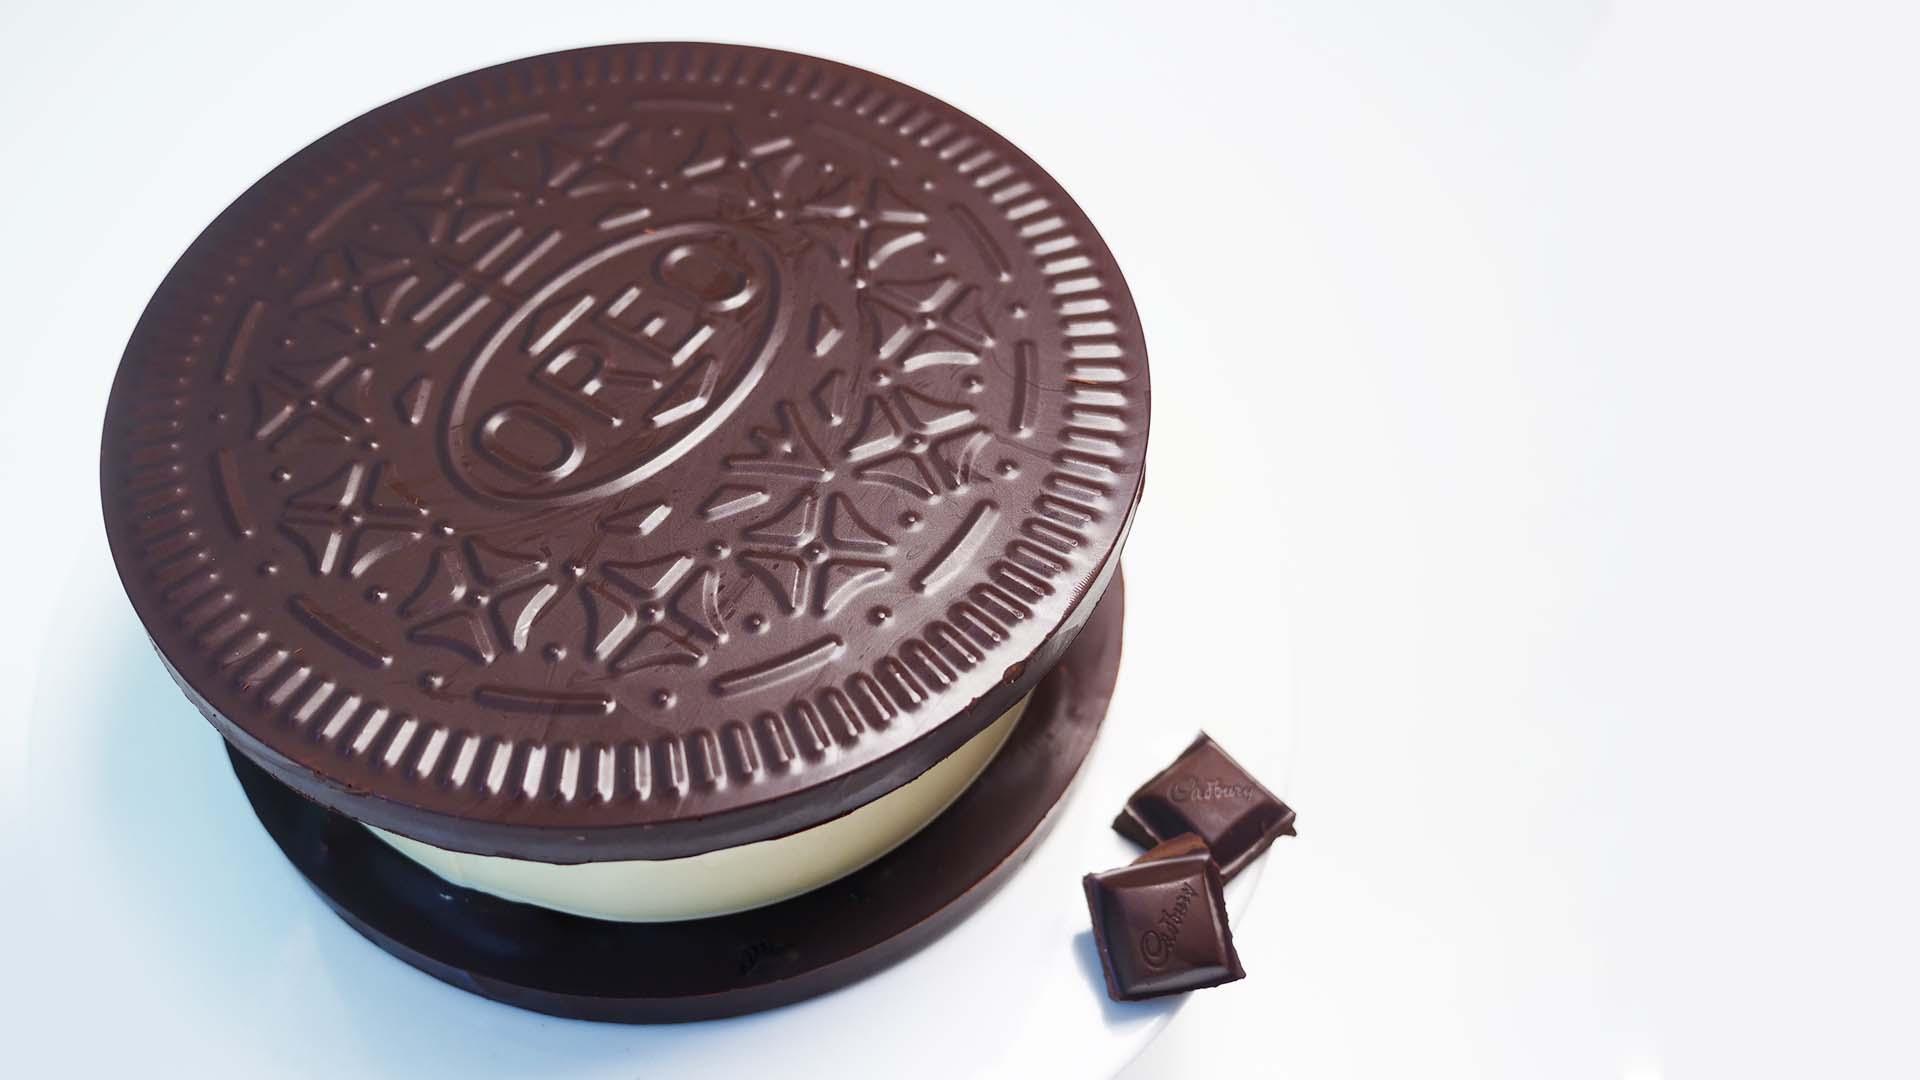 chocolate Oreo box ann reardon